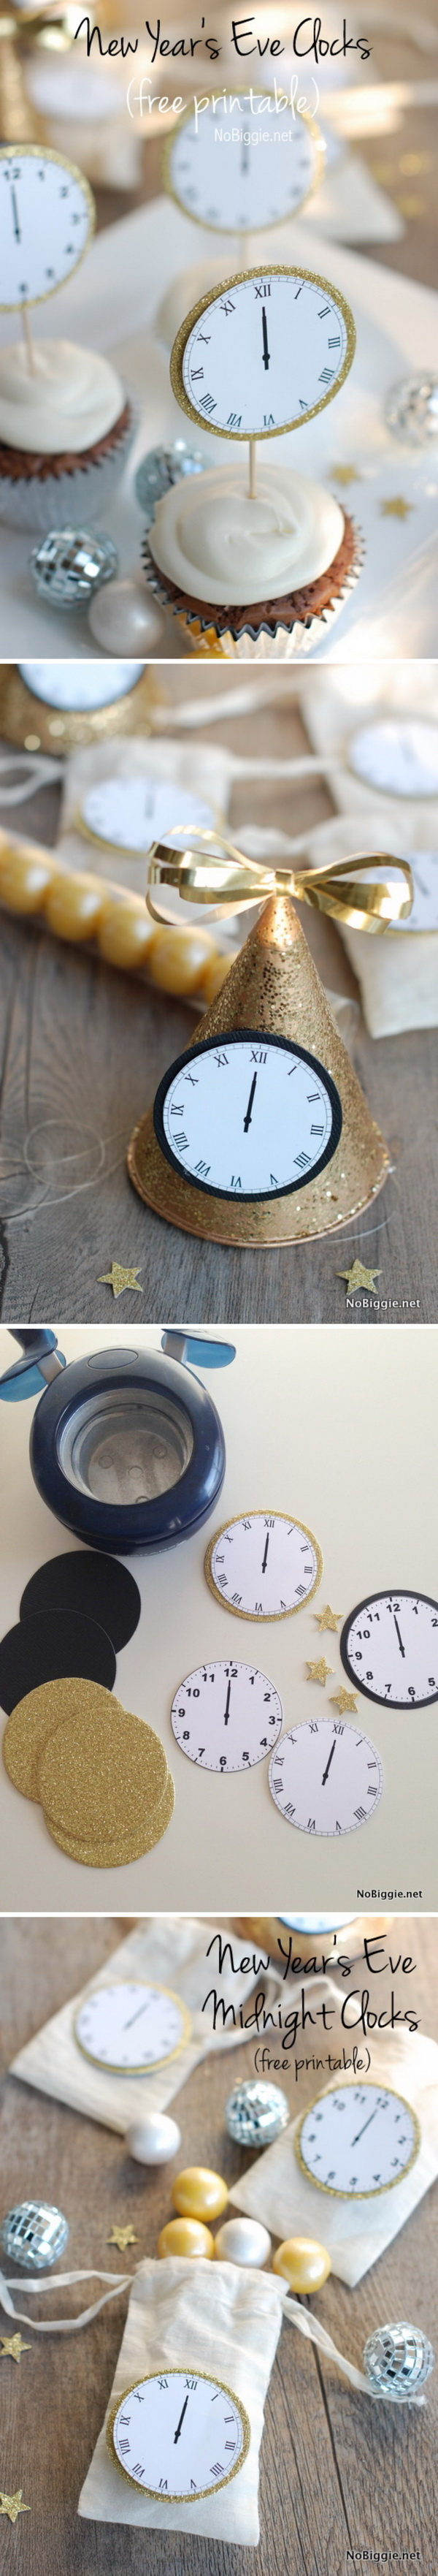 New Year's Eve Midnight Clock Free Printable